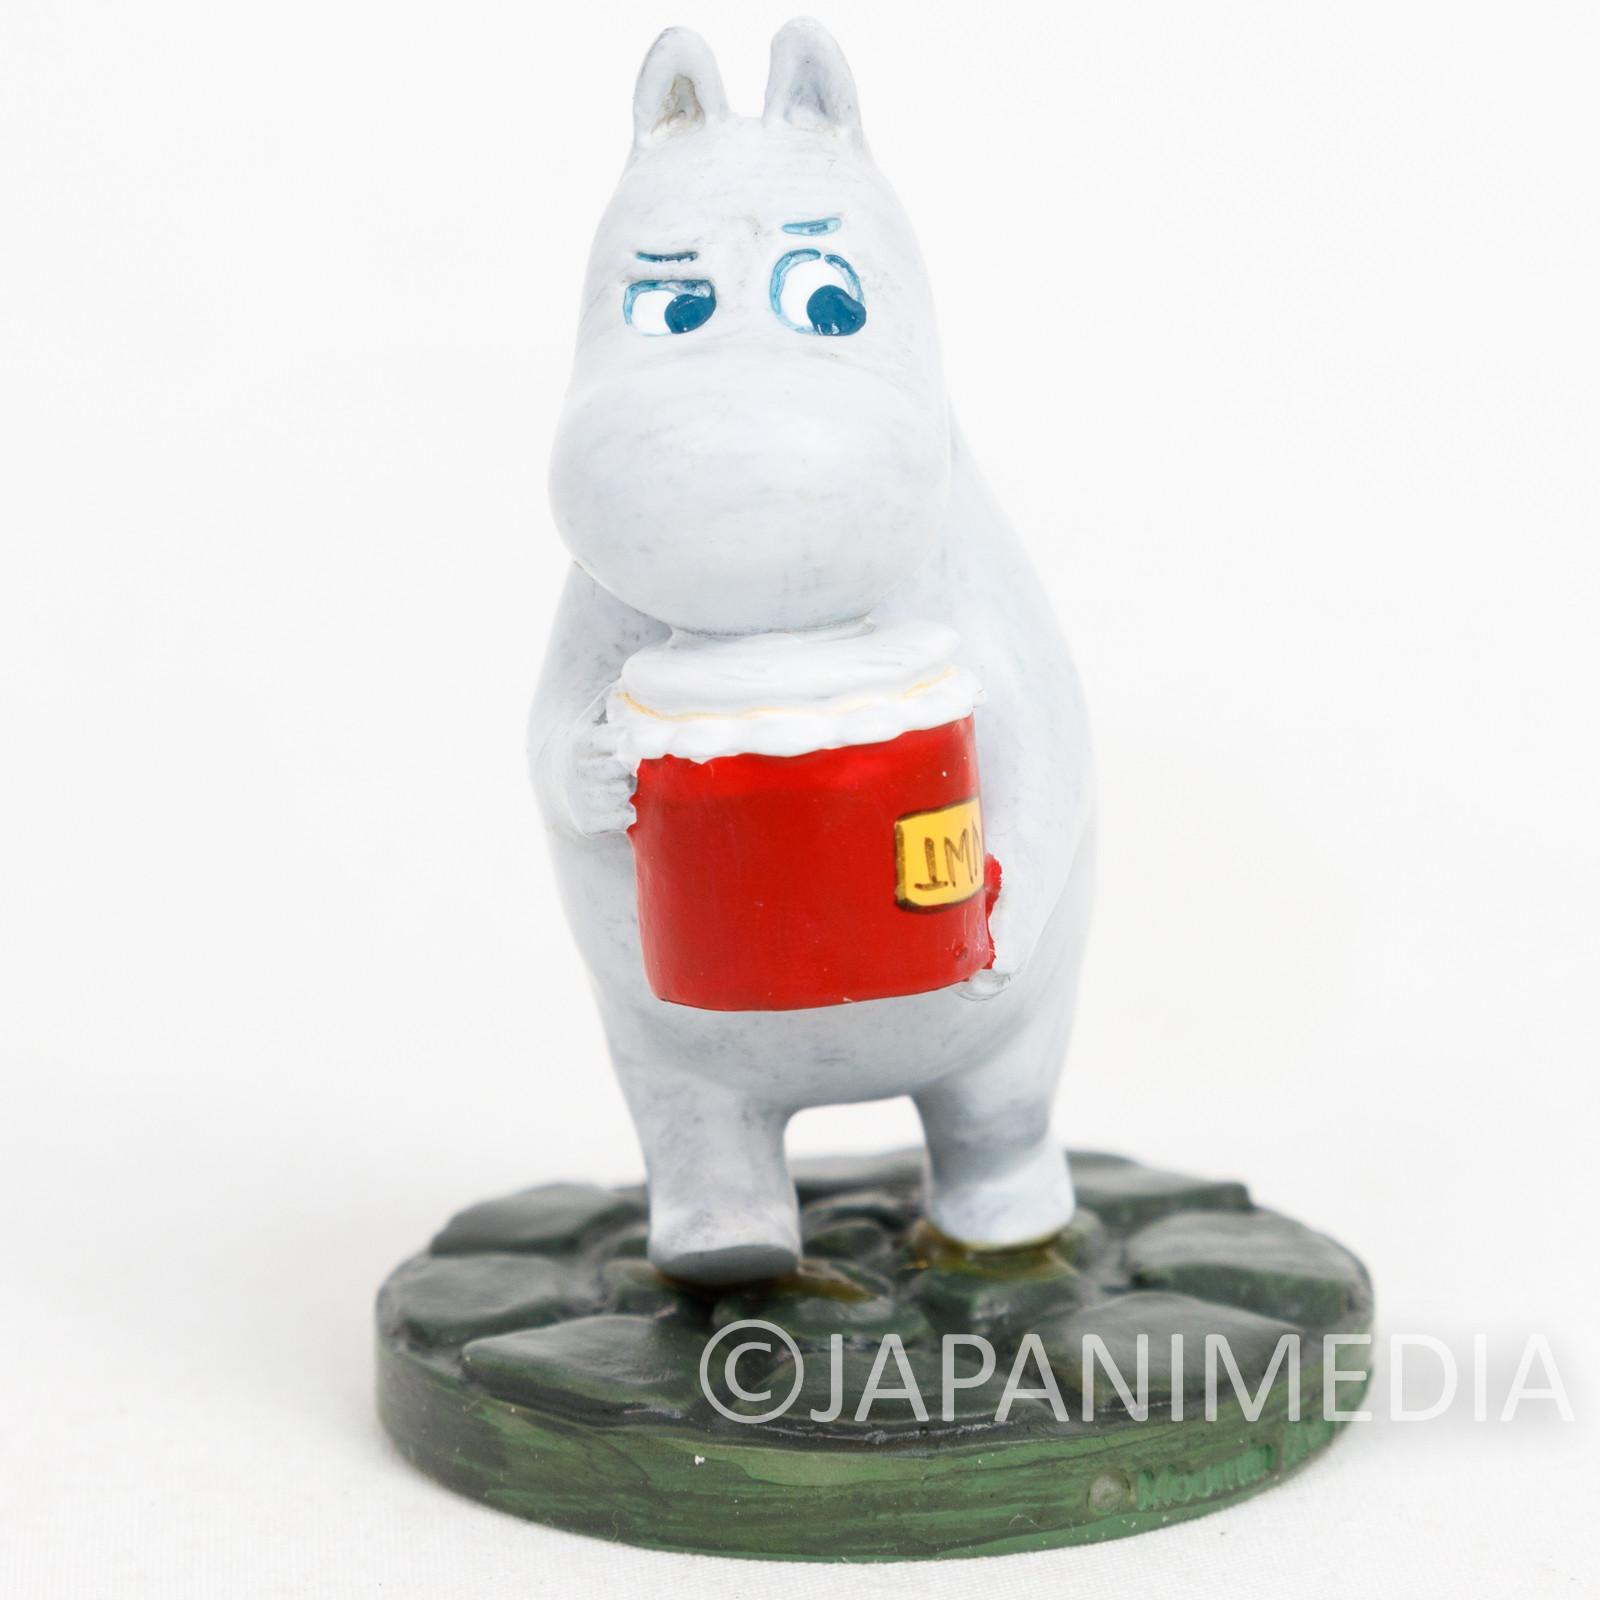 RARE! Moomin Characters Moomintroll Original Comics Ver. Mini Figure Benelic 2